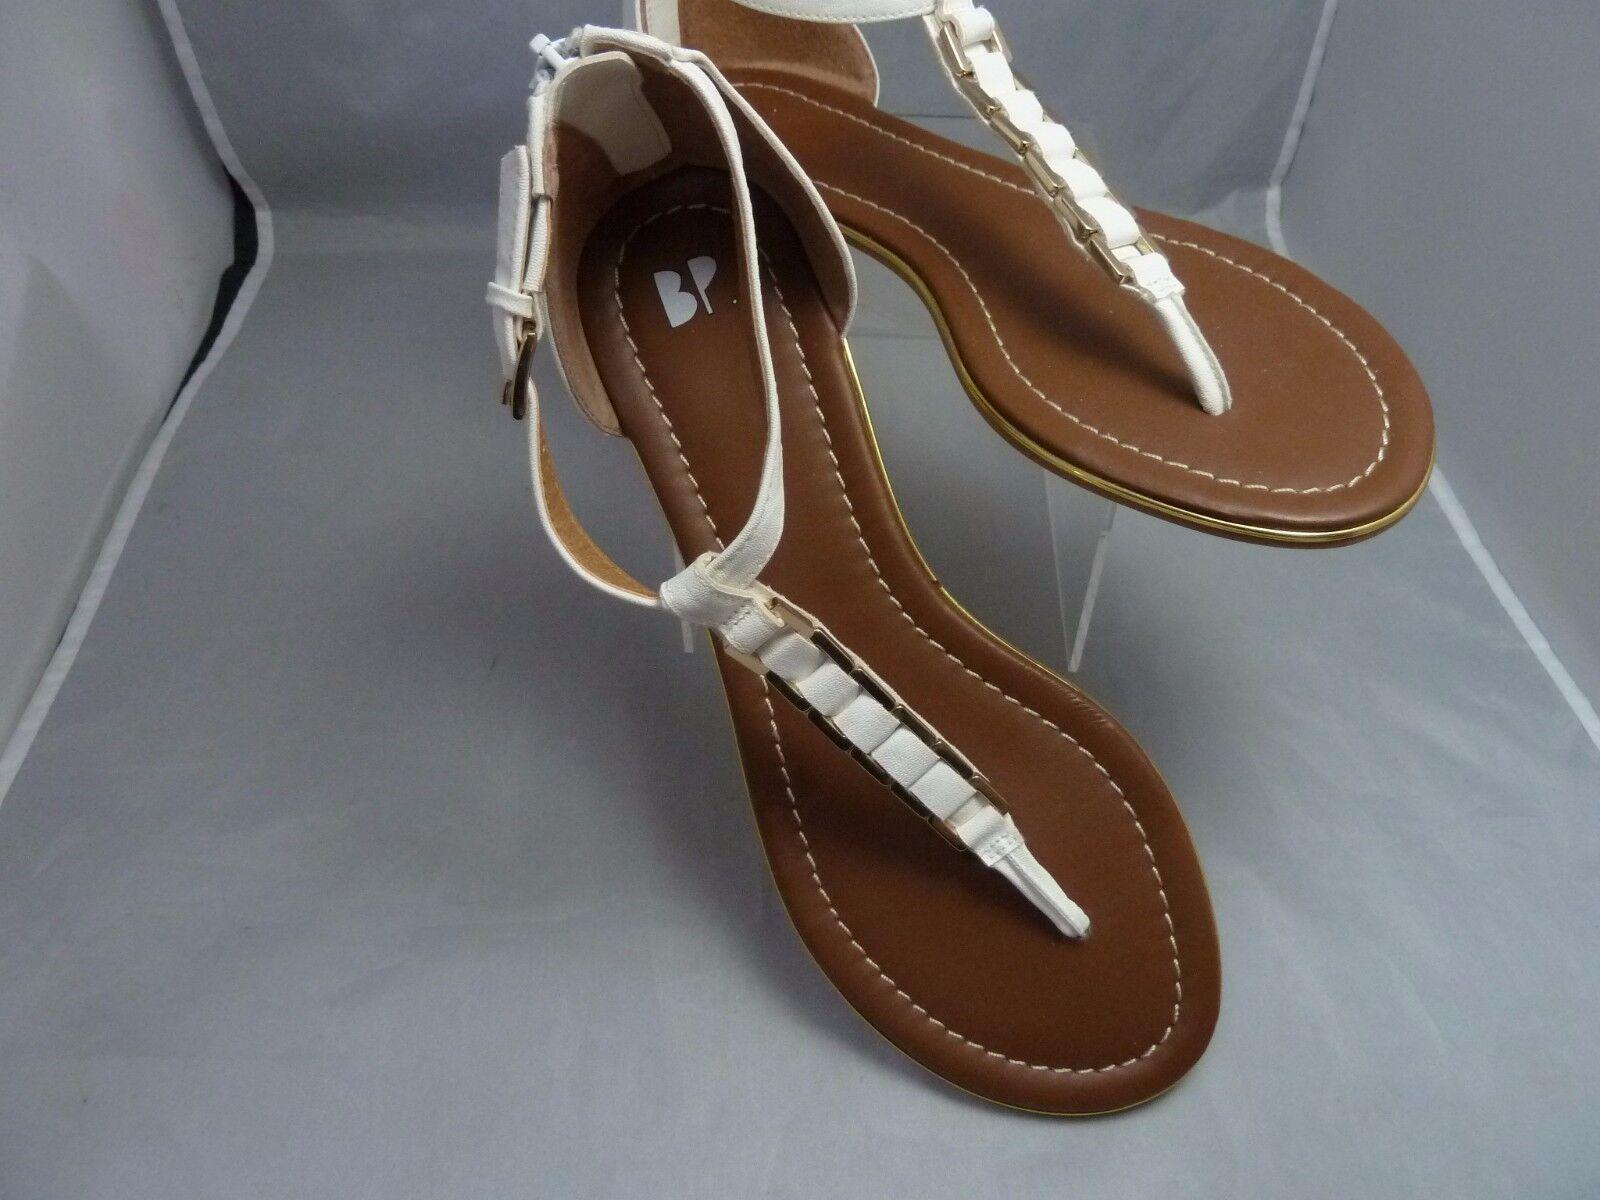 BP Nordstrom Women's - sz 8 - /   Leather  Sandals  / brass buckle  zipper back wht 247909